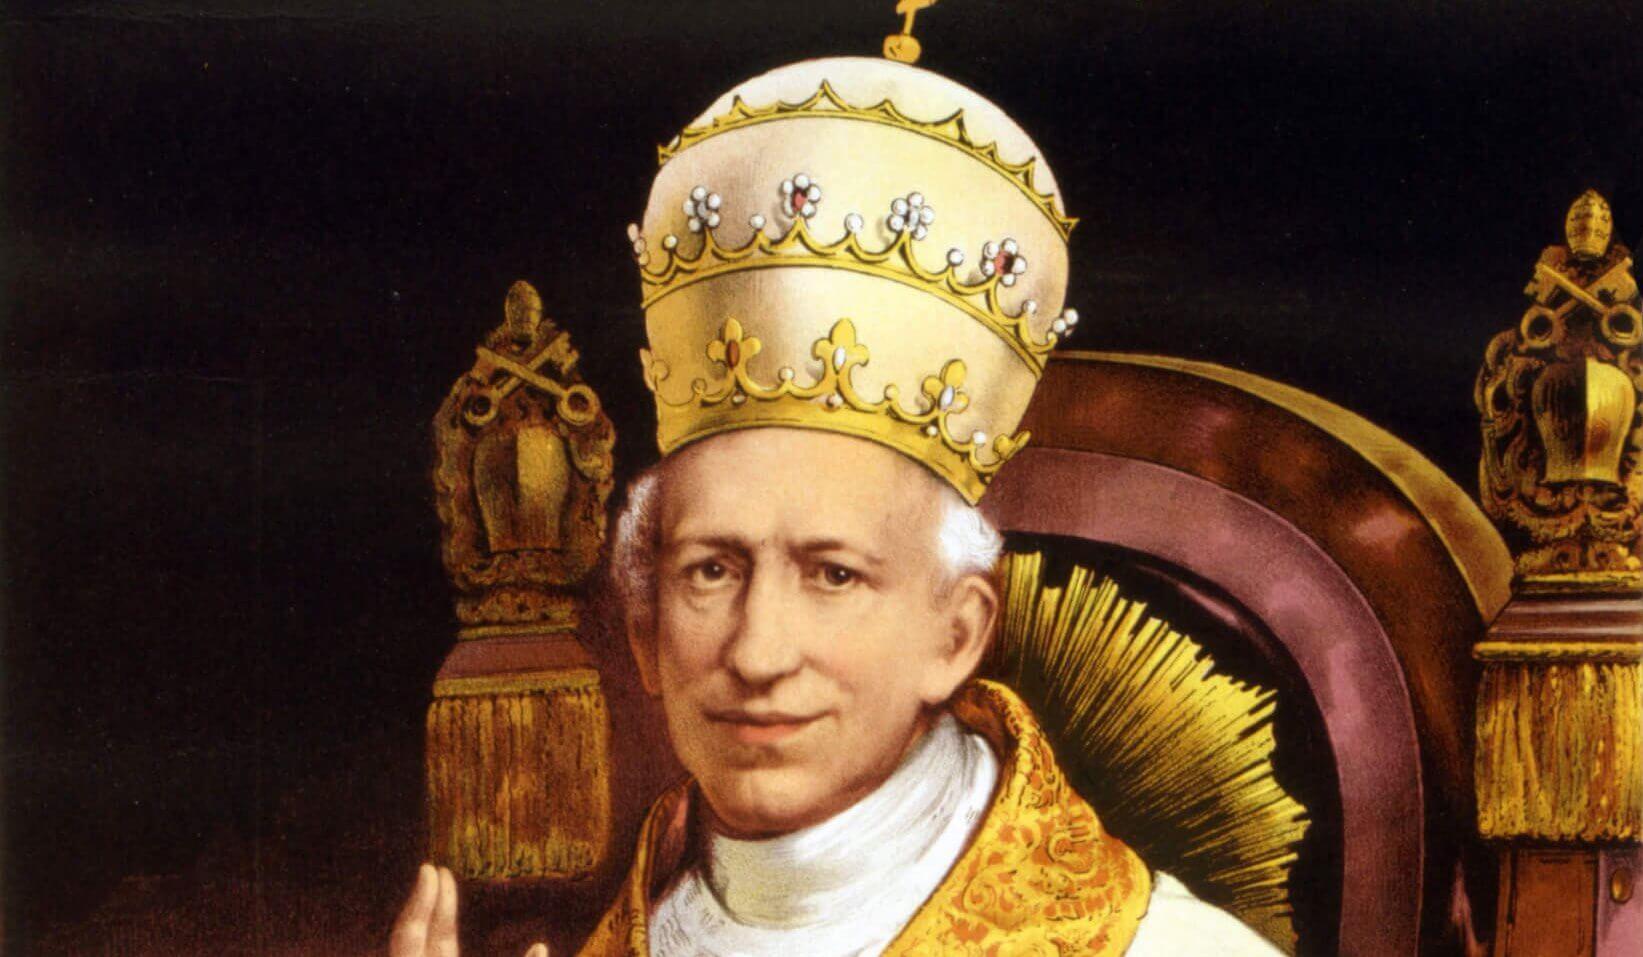 Bild: Leo XIII. / Authentic portrait from the Vatican album of the Ecumenical Council. [Public domain], via Wikimedia Commons